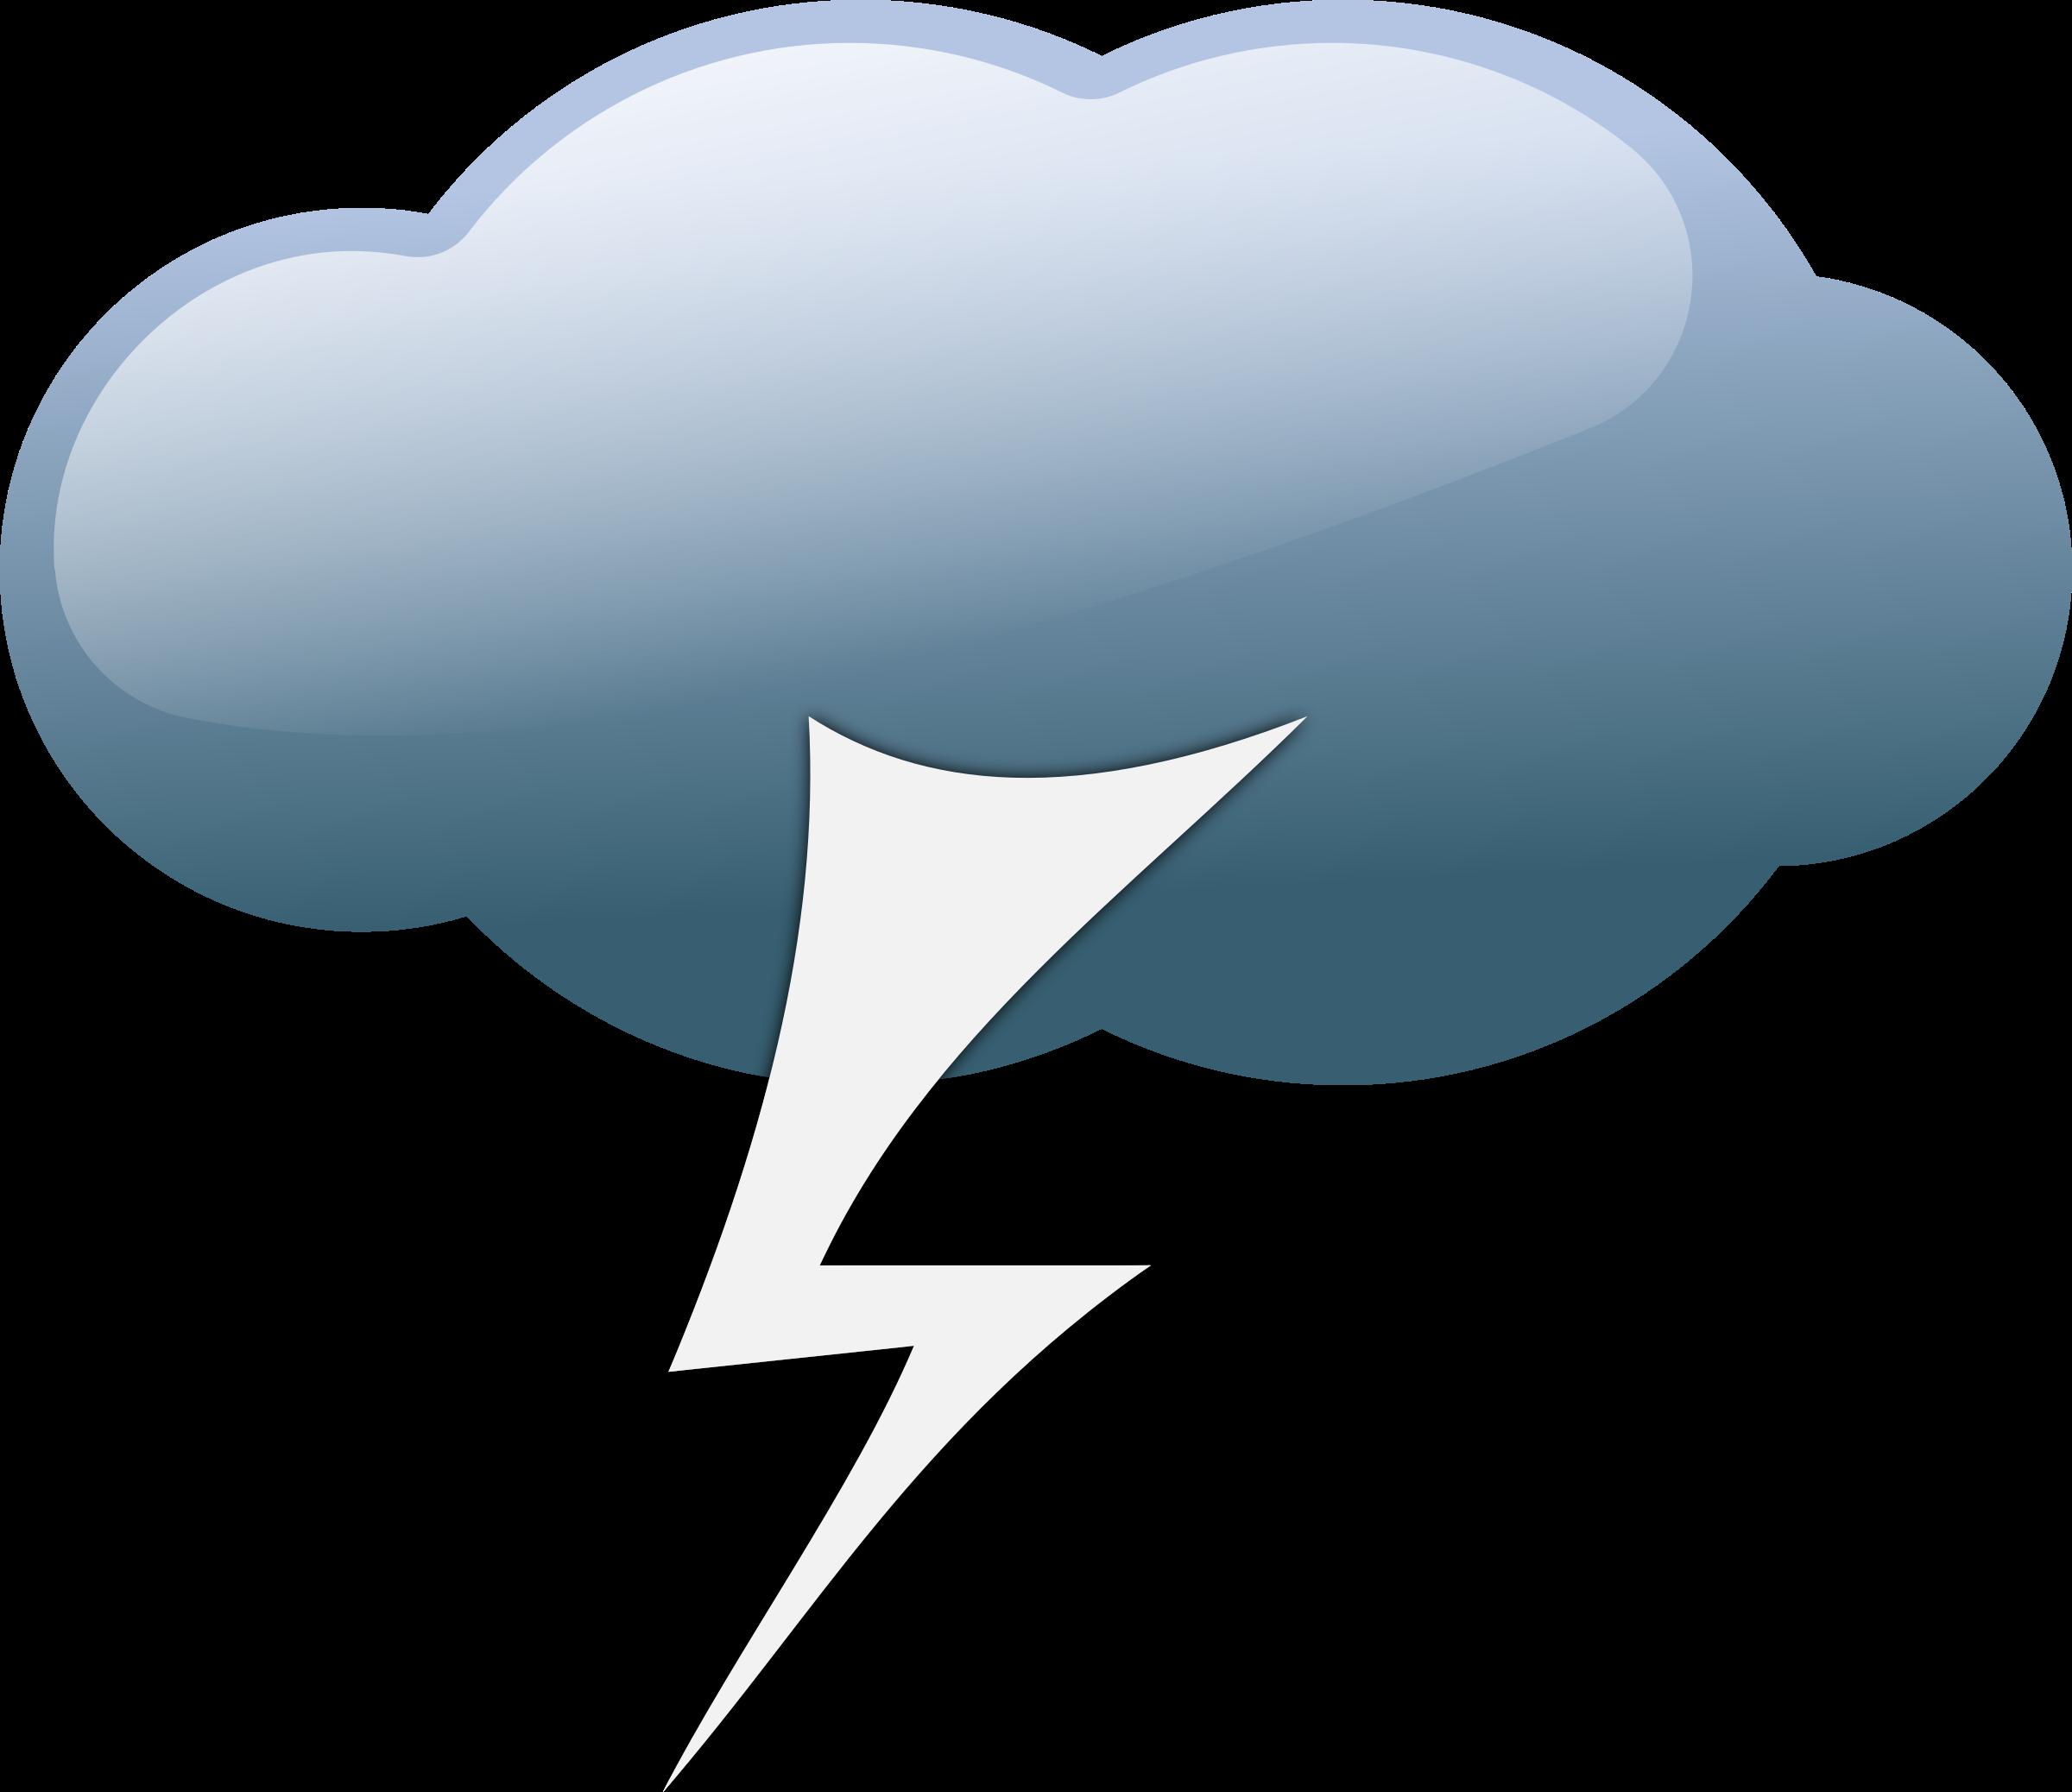 Weather symbols big image. Windy clipart cloud